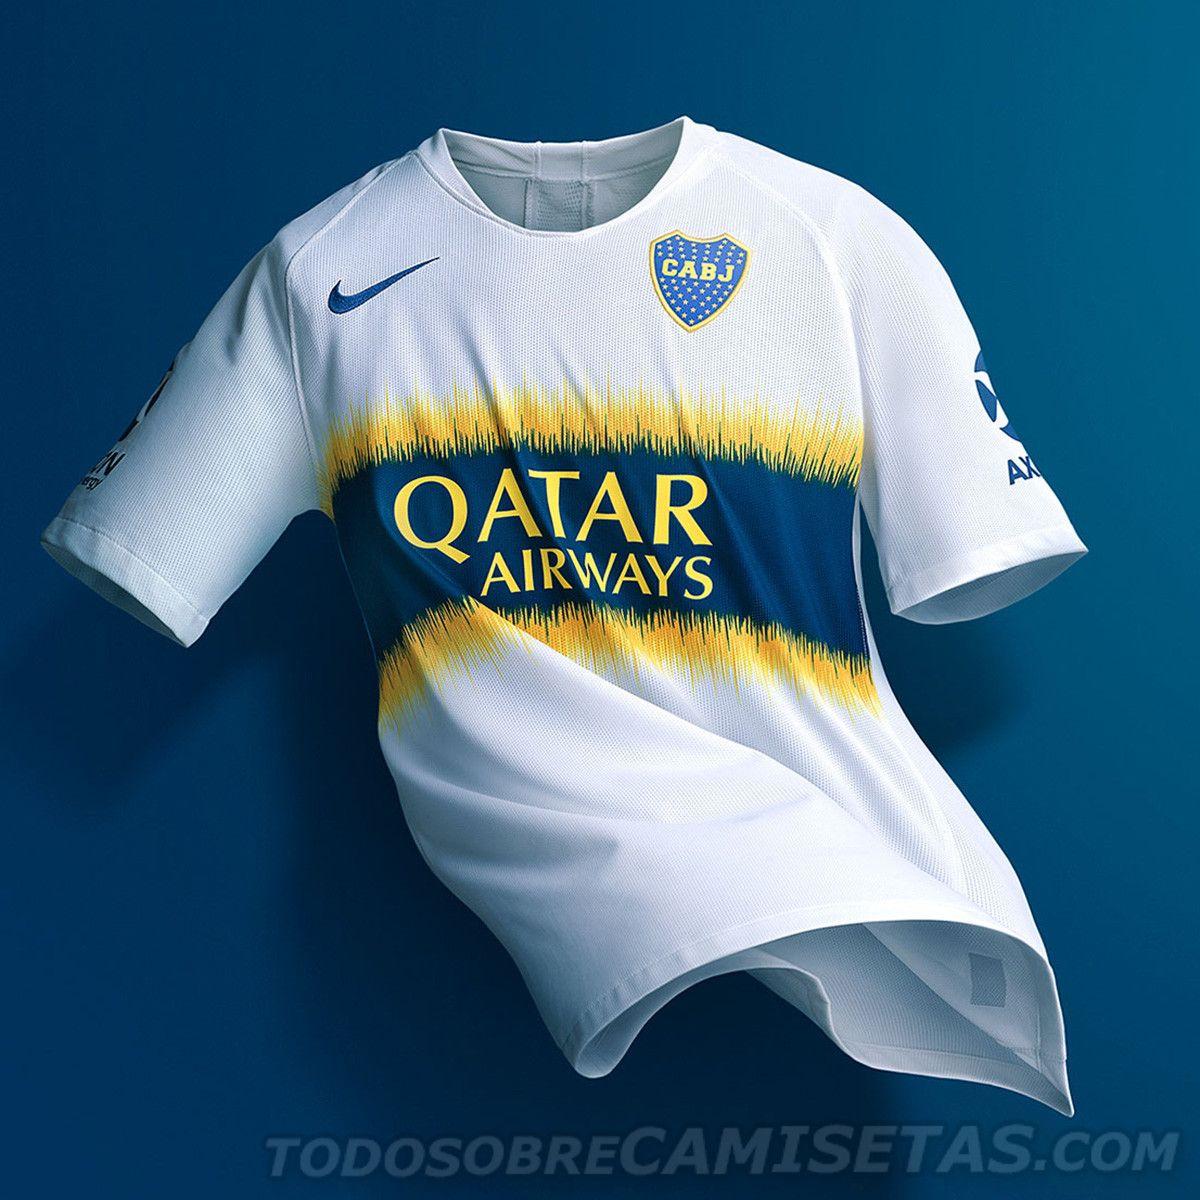 78ca0baa608d7 Camisetas Nike de Boca Juniors 2018-19